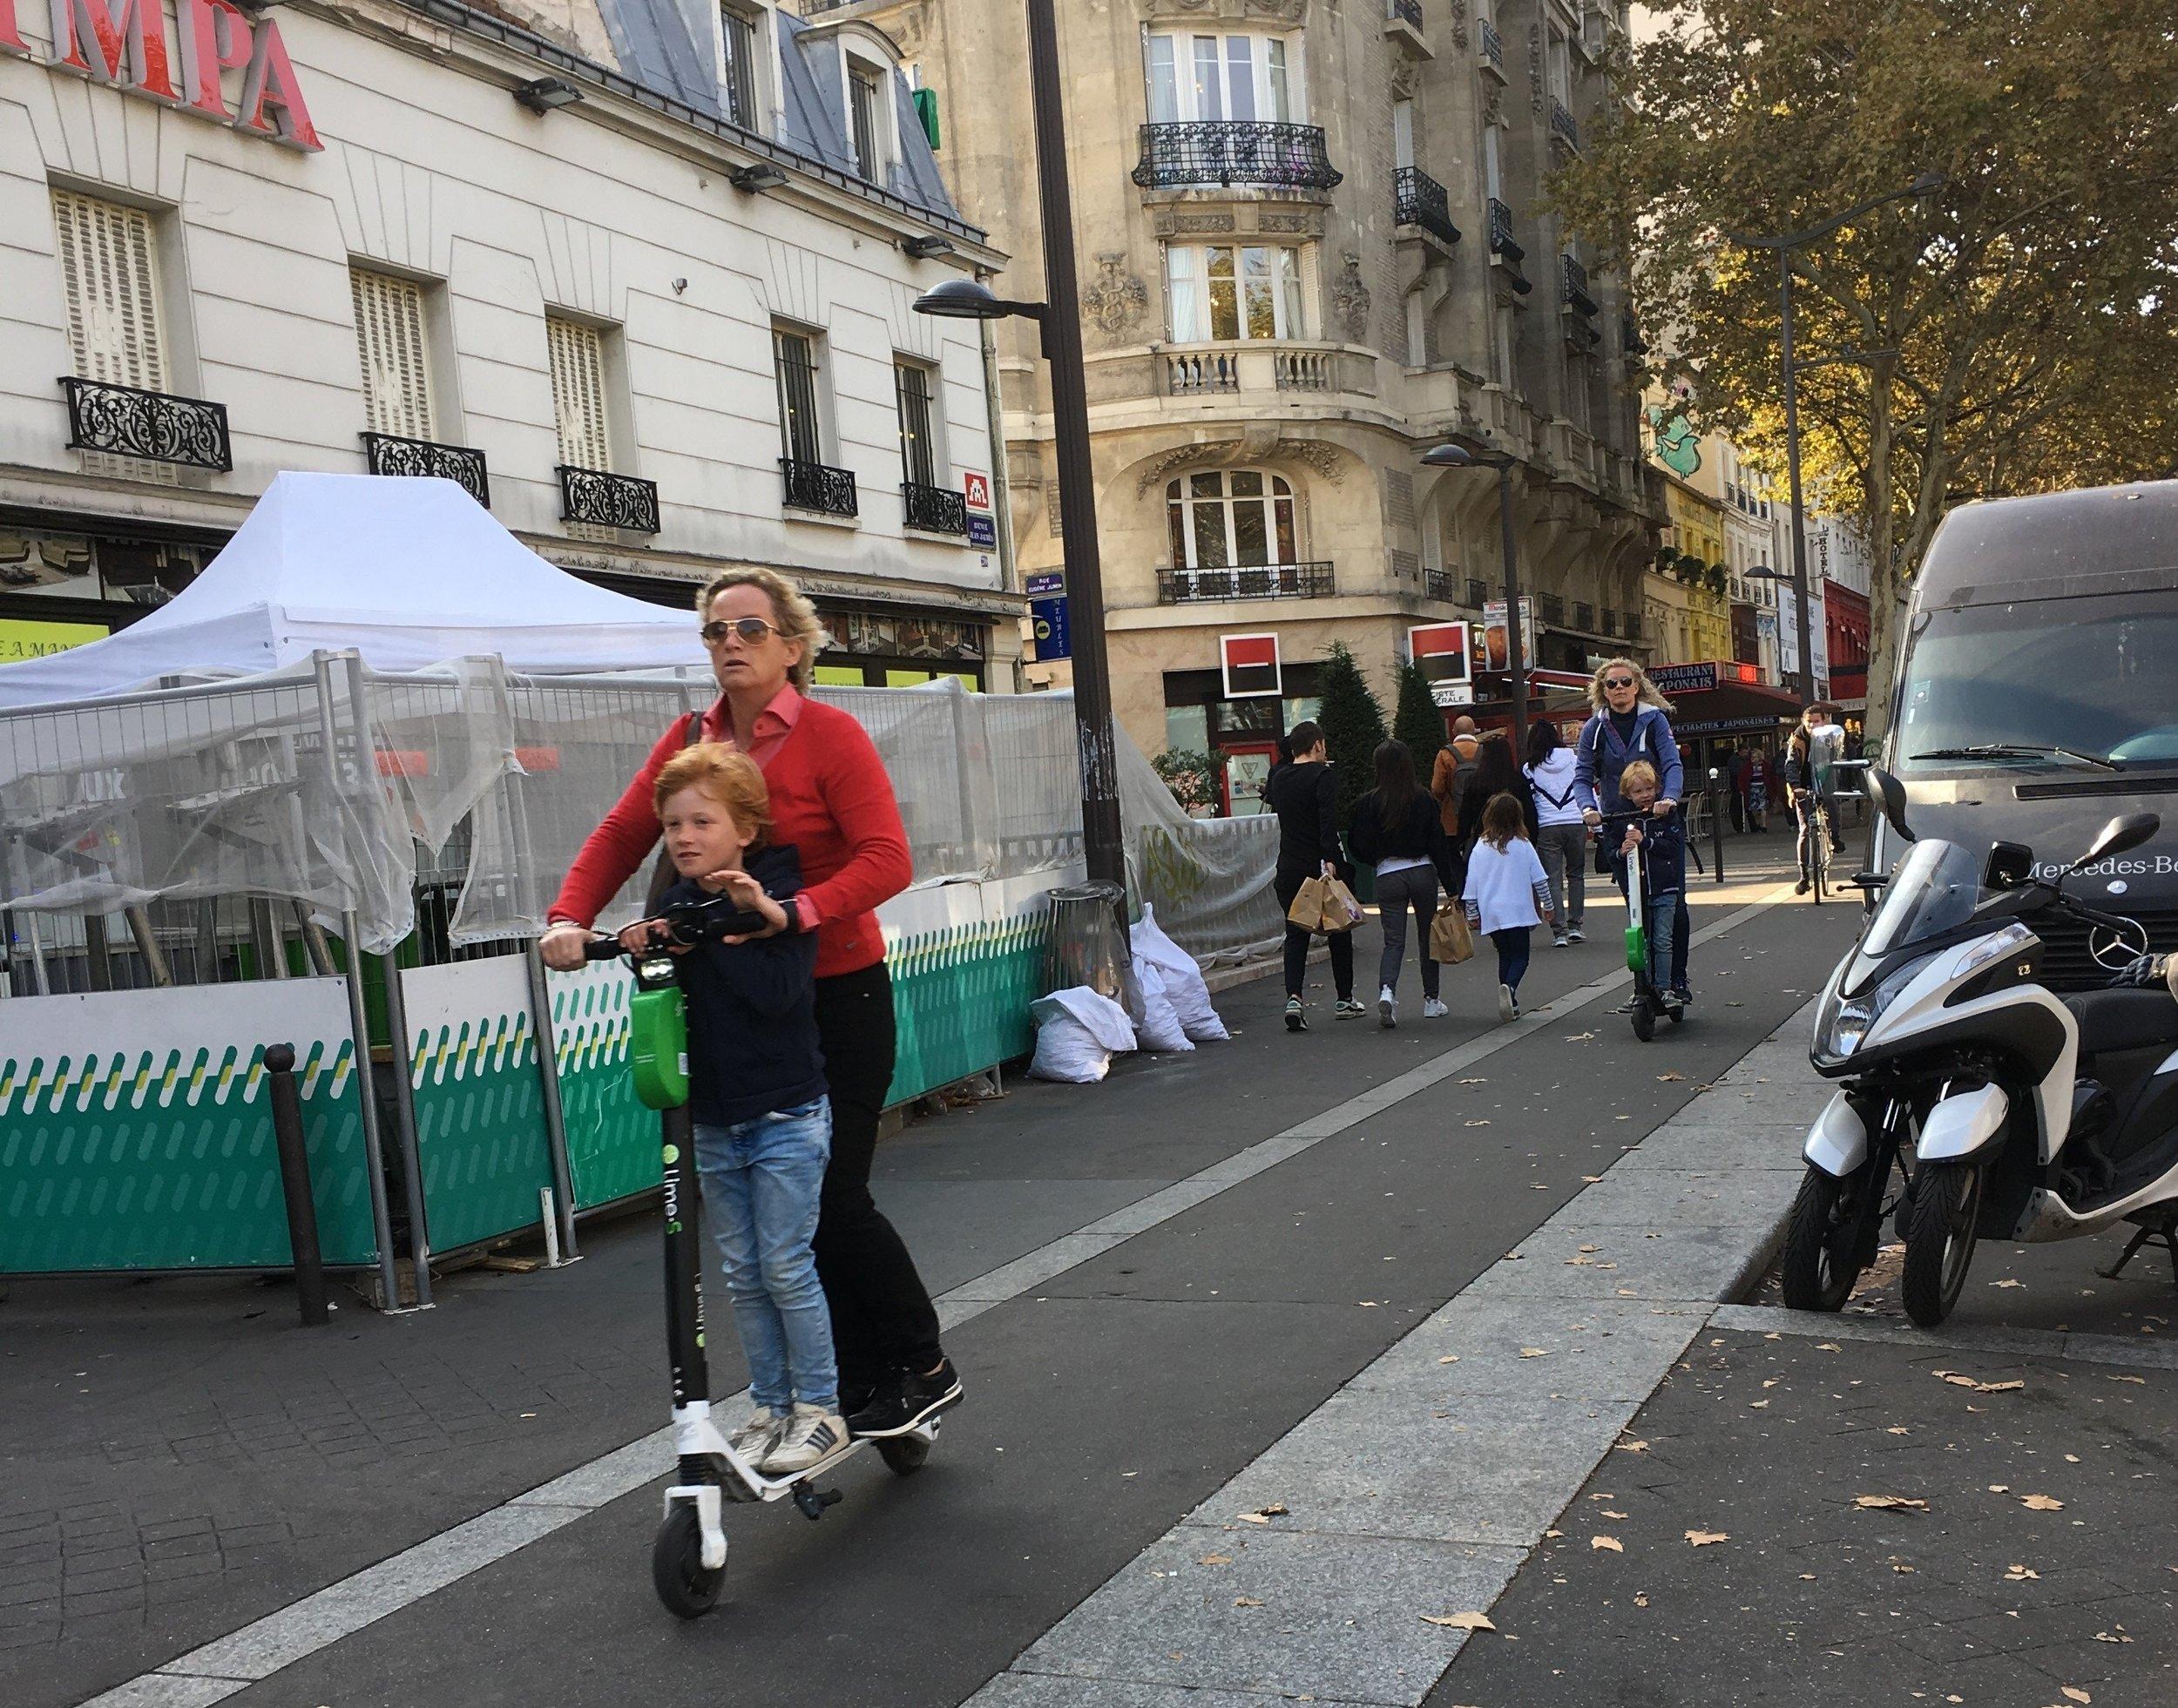 sparkesykkel-Paris-2.jpg